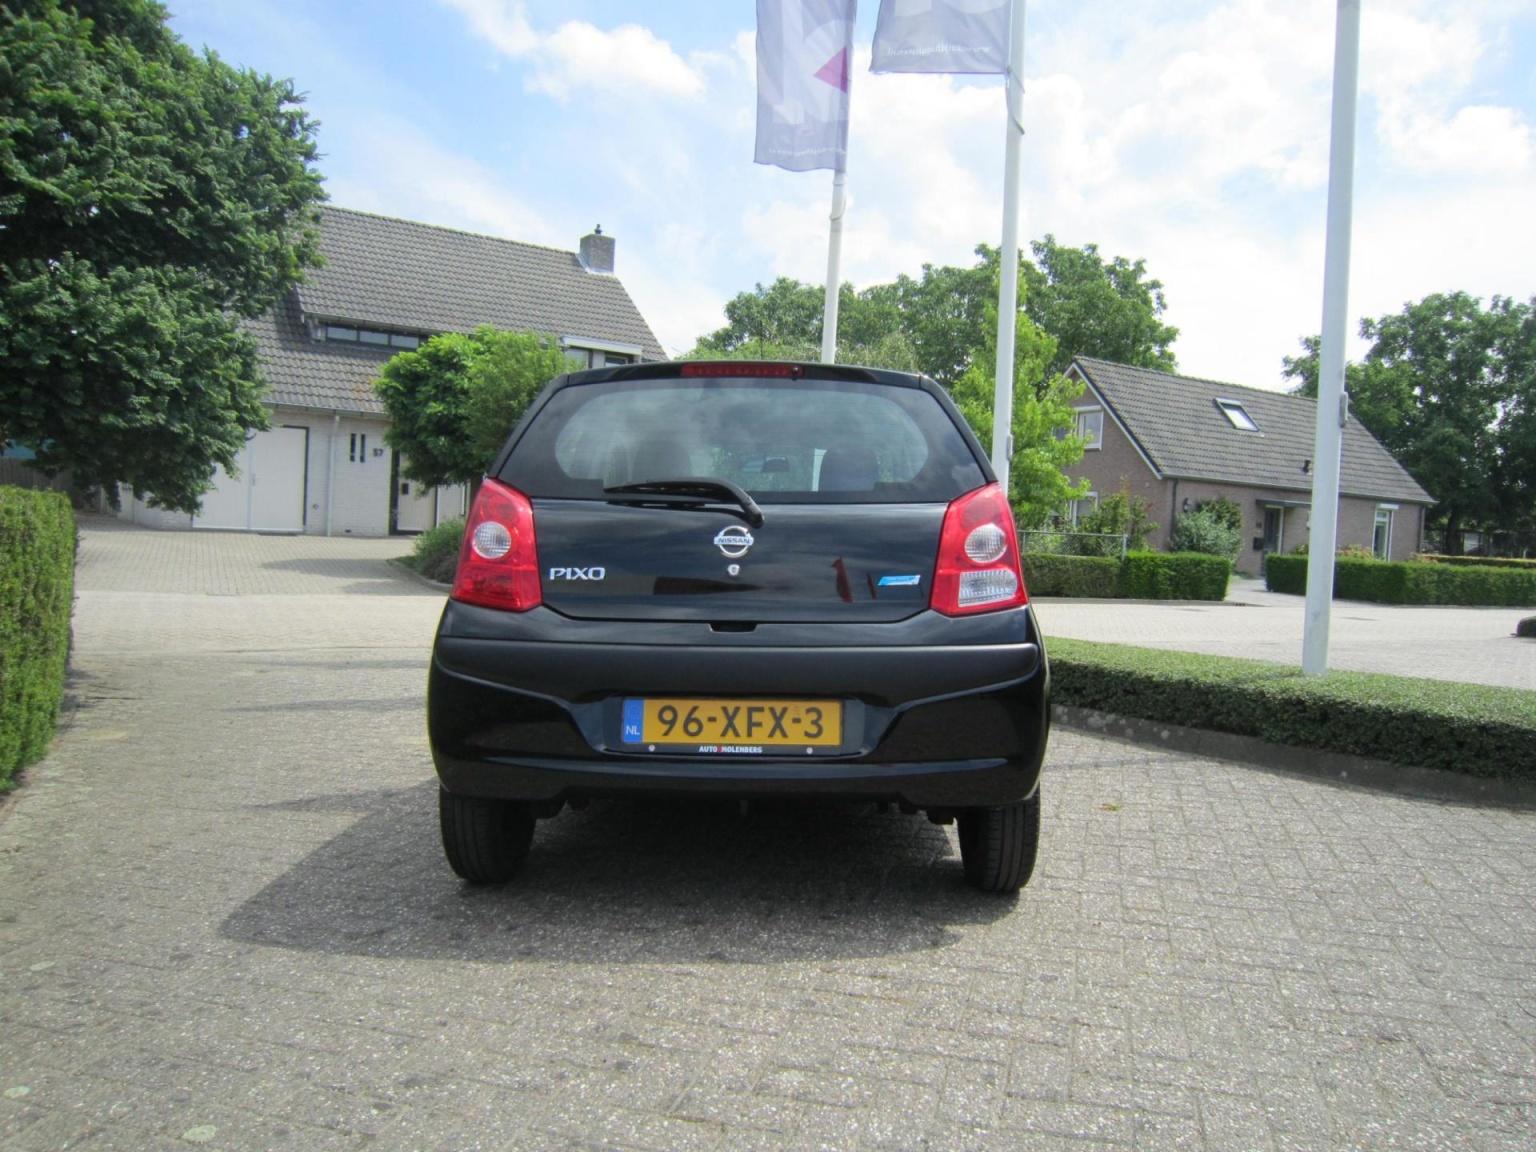 Nissan-Pixo-4